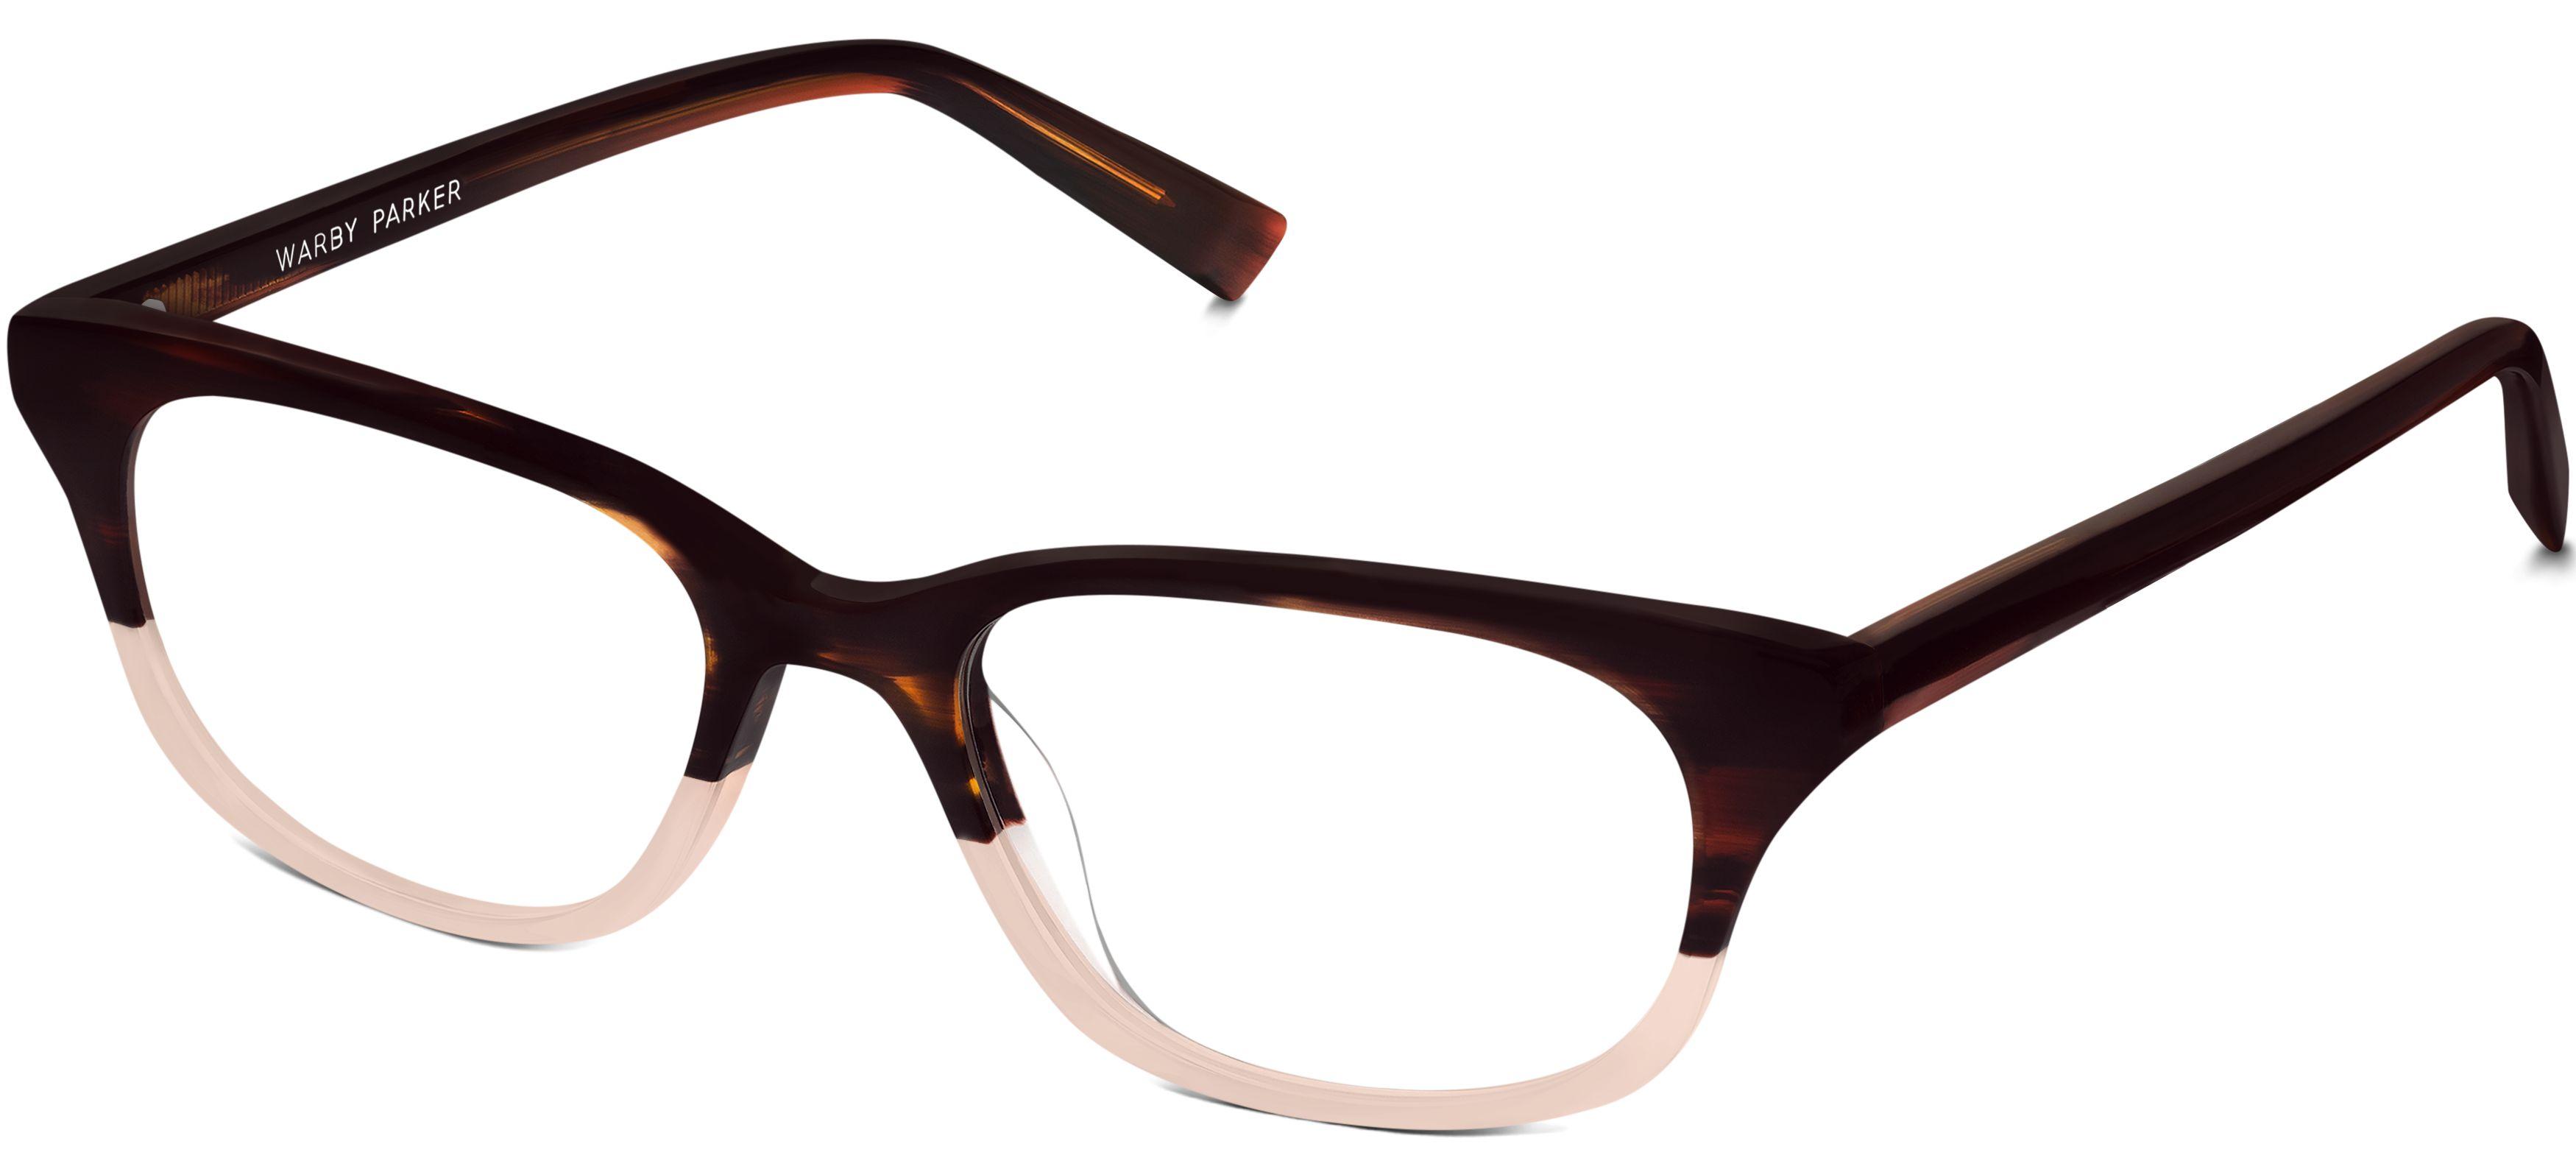 Rose Eyeglasses in Tea Rose Fade for Women | Warby Parker